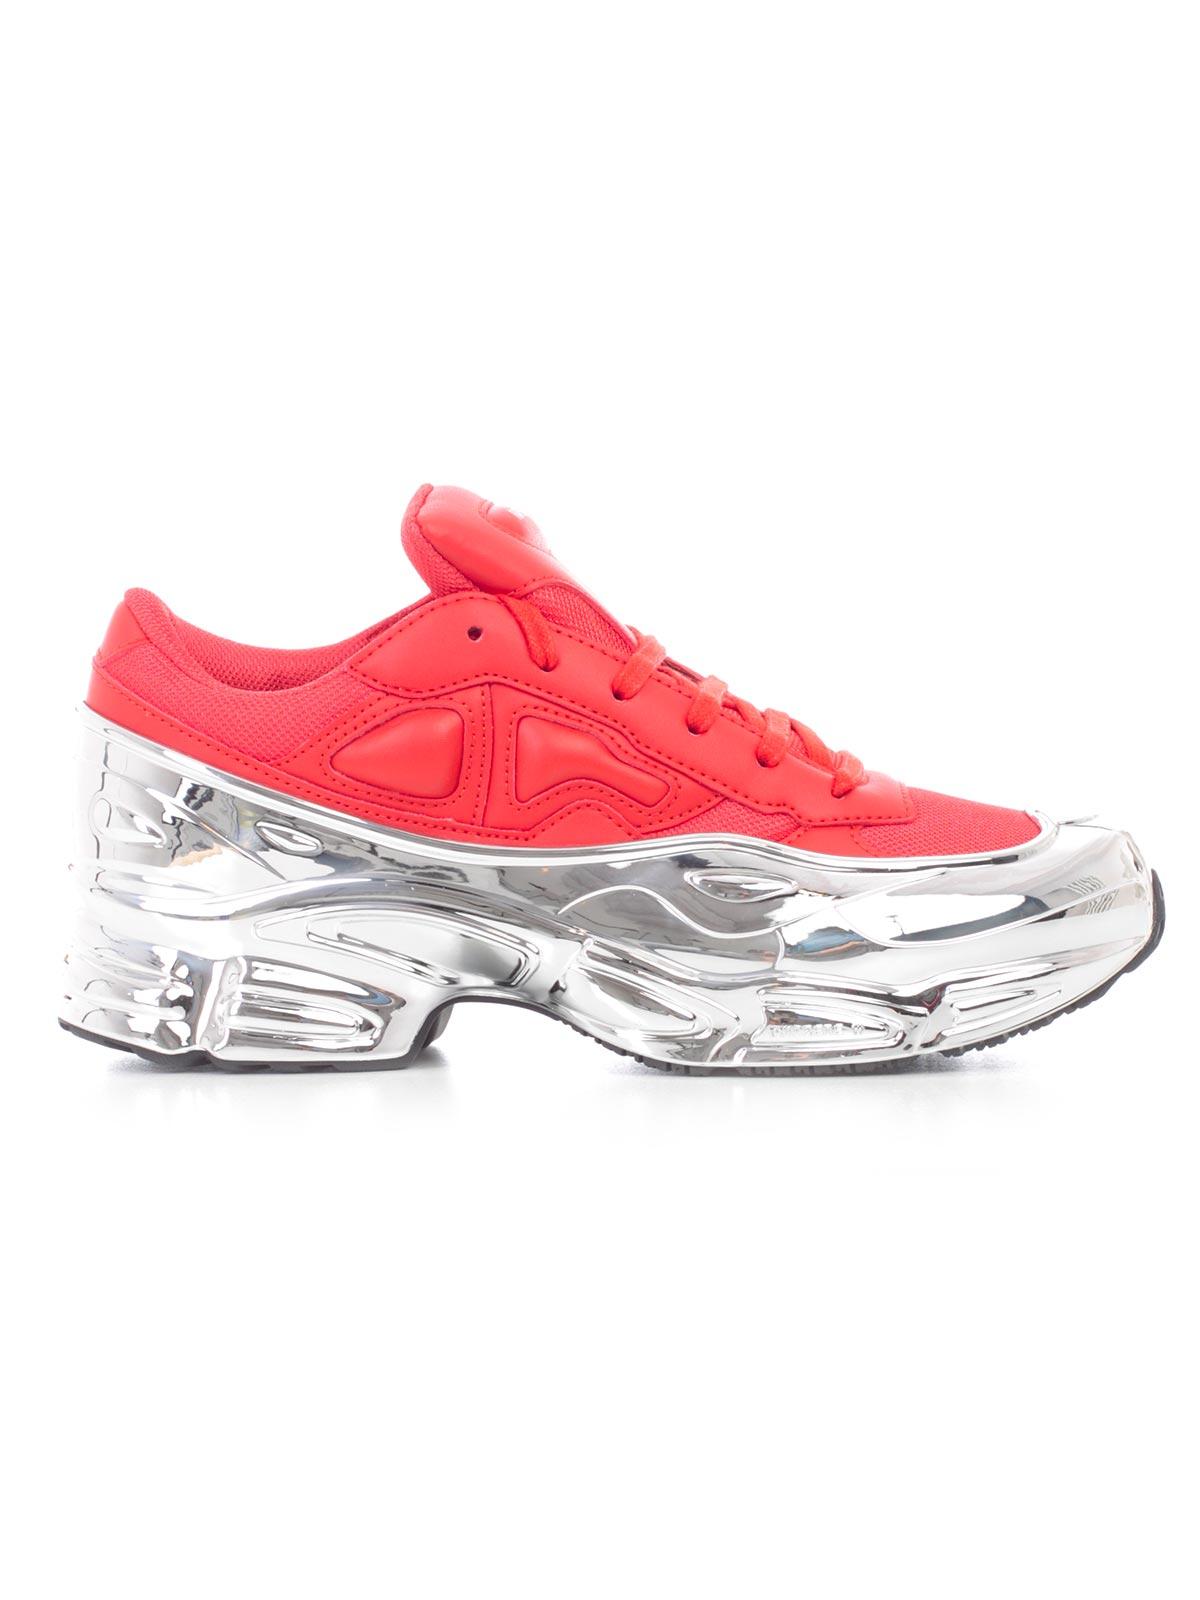 Adidas Raf X Raf Simons Adidas Shoes X Simons Adidas Shoes nwP80Ok